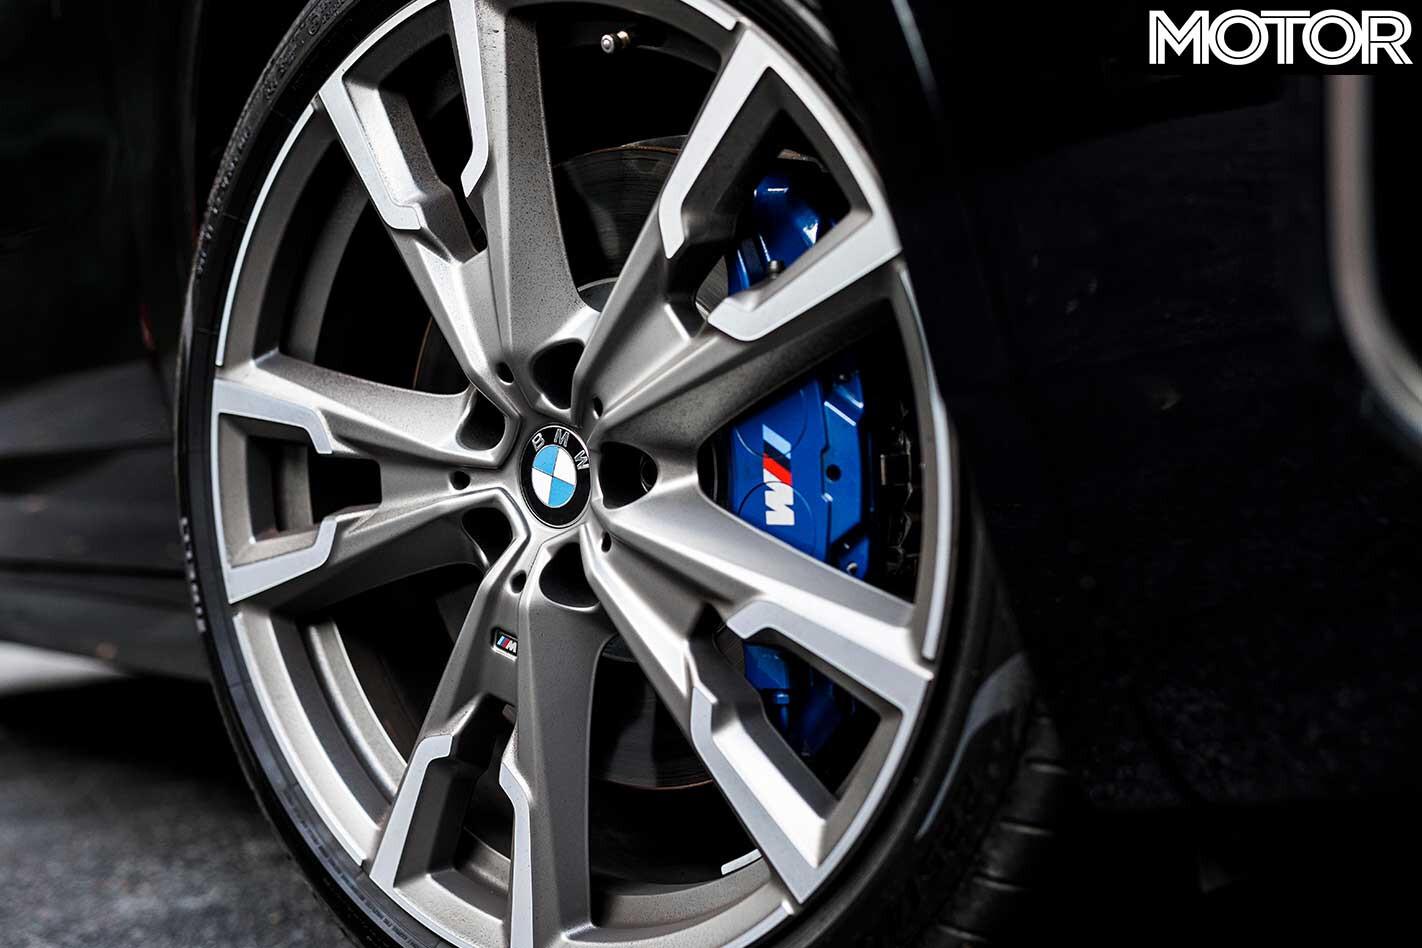 2019 BMW X 2 X Drive M 35 I Wheel Tyre Brakes Jpg